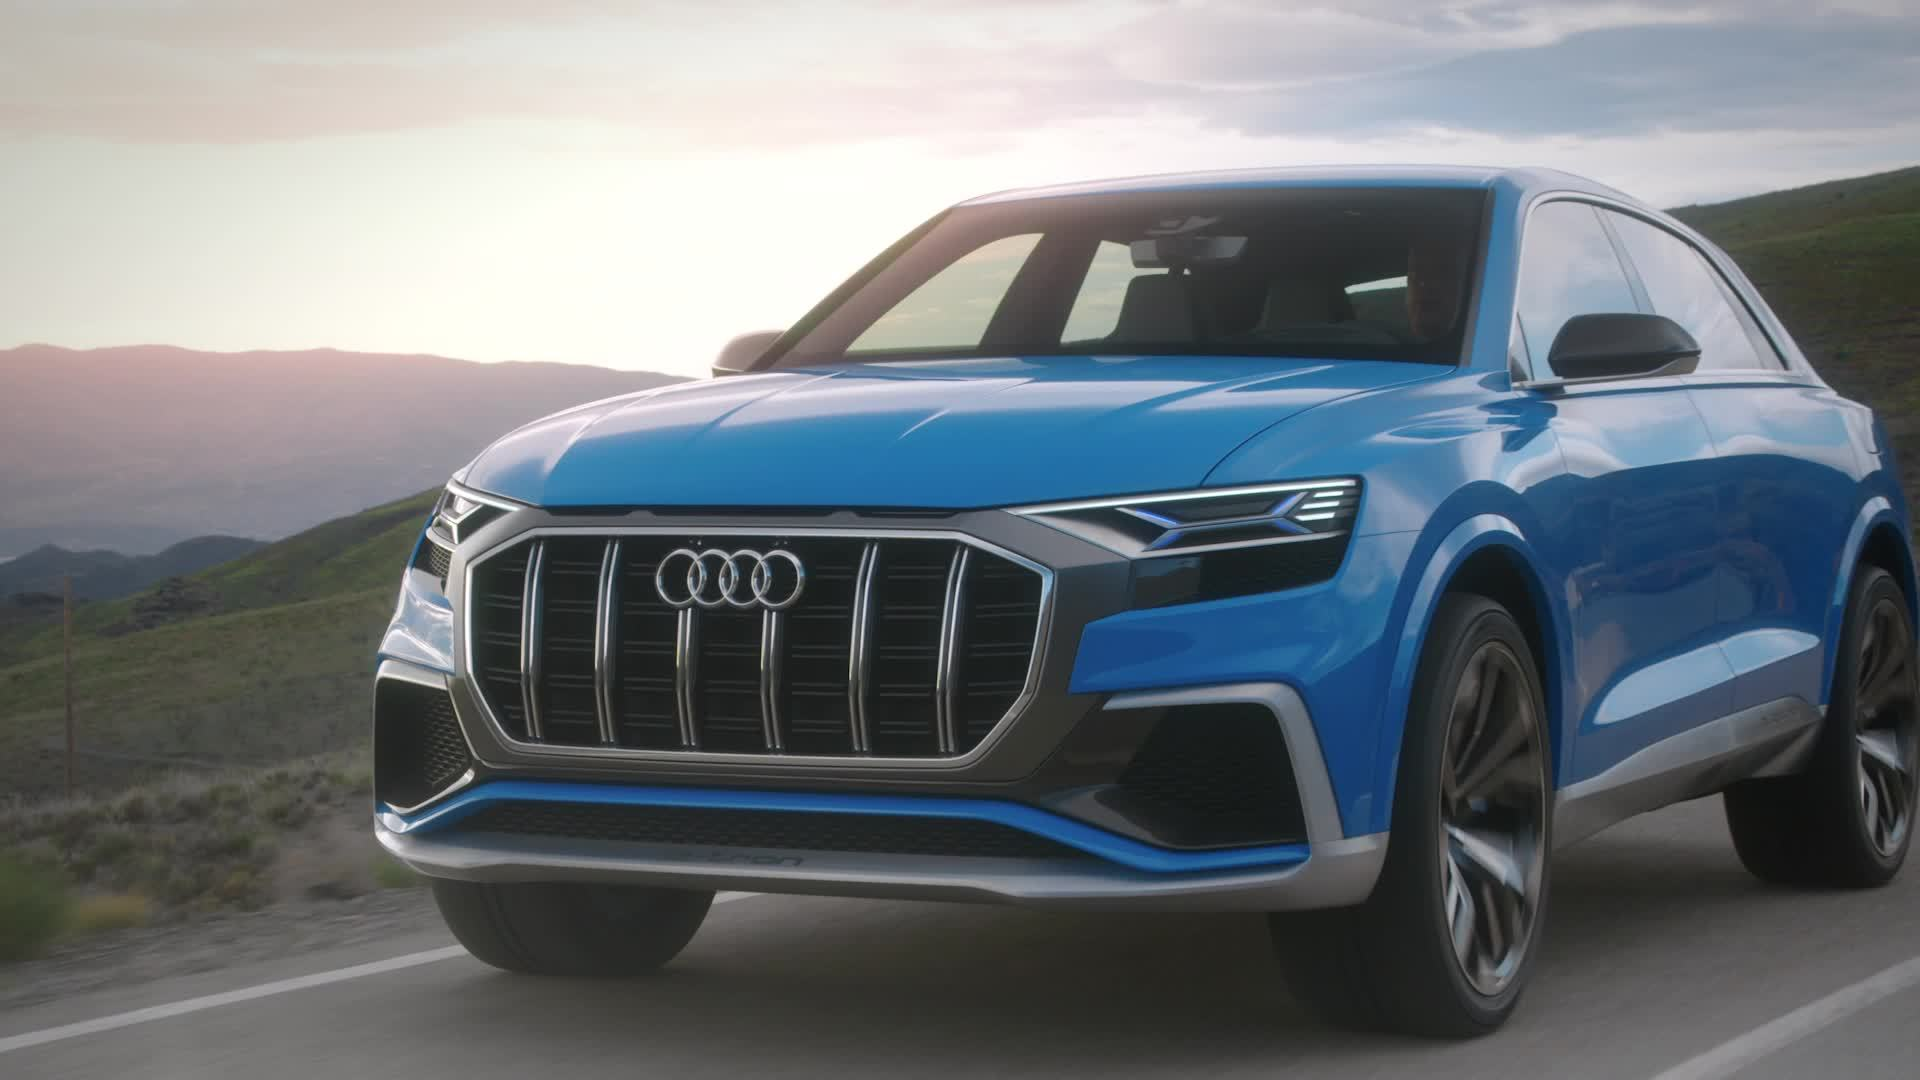 The new Audi Q8 concept